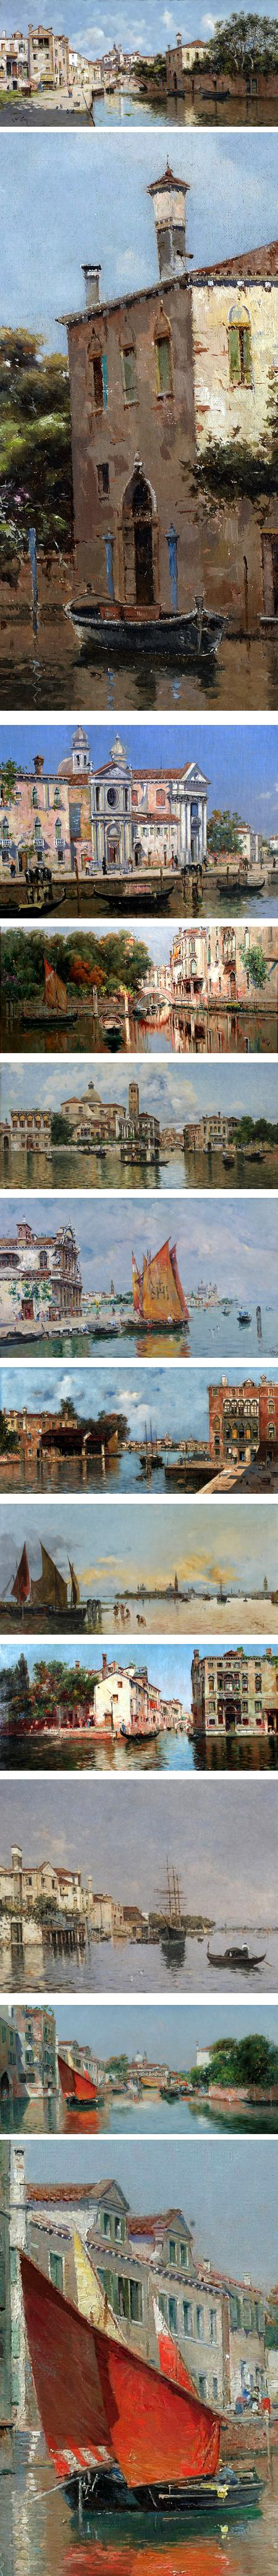 Antonio Maria de Reyna Manescau, paintings of Venice